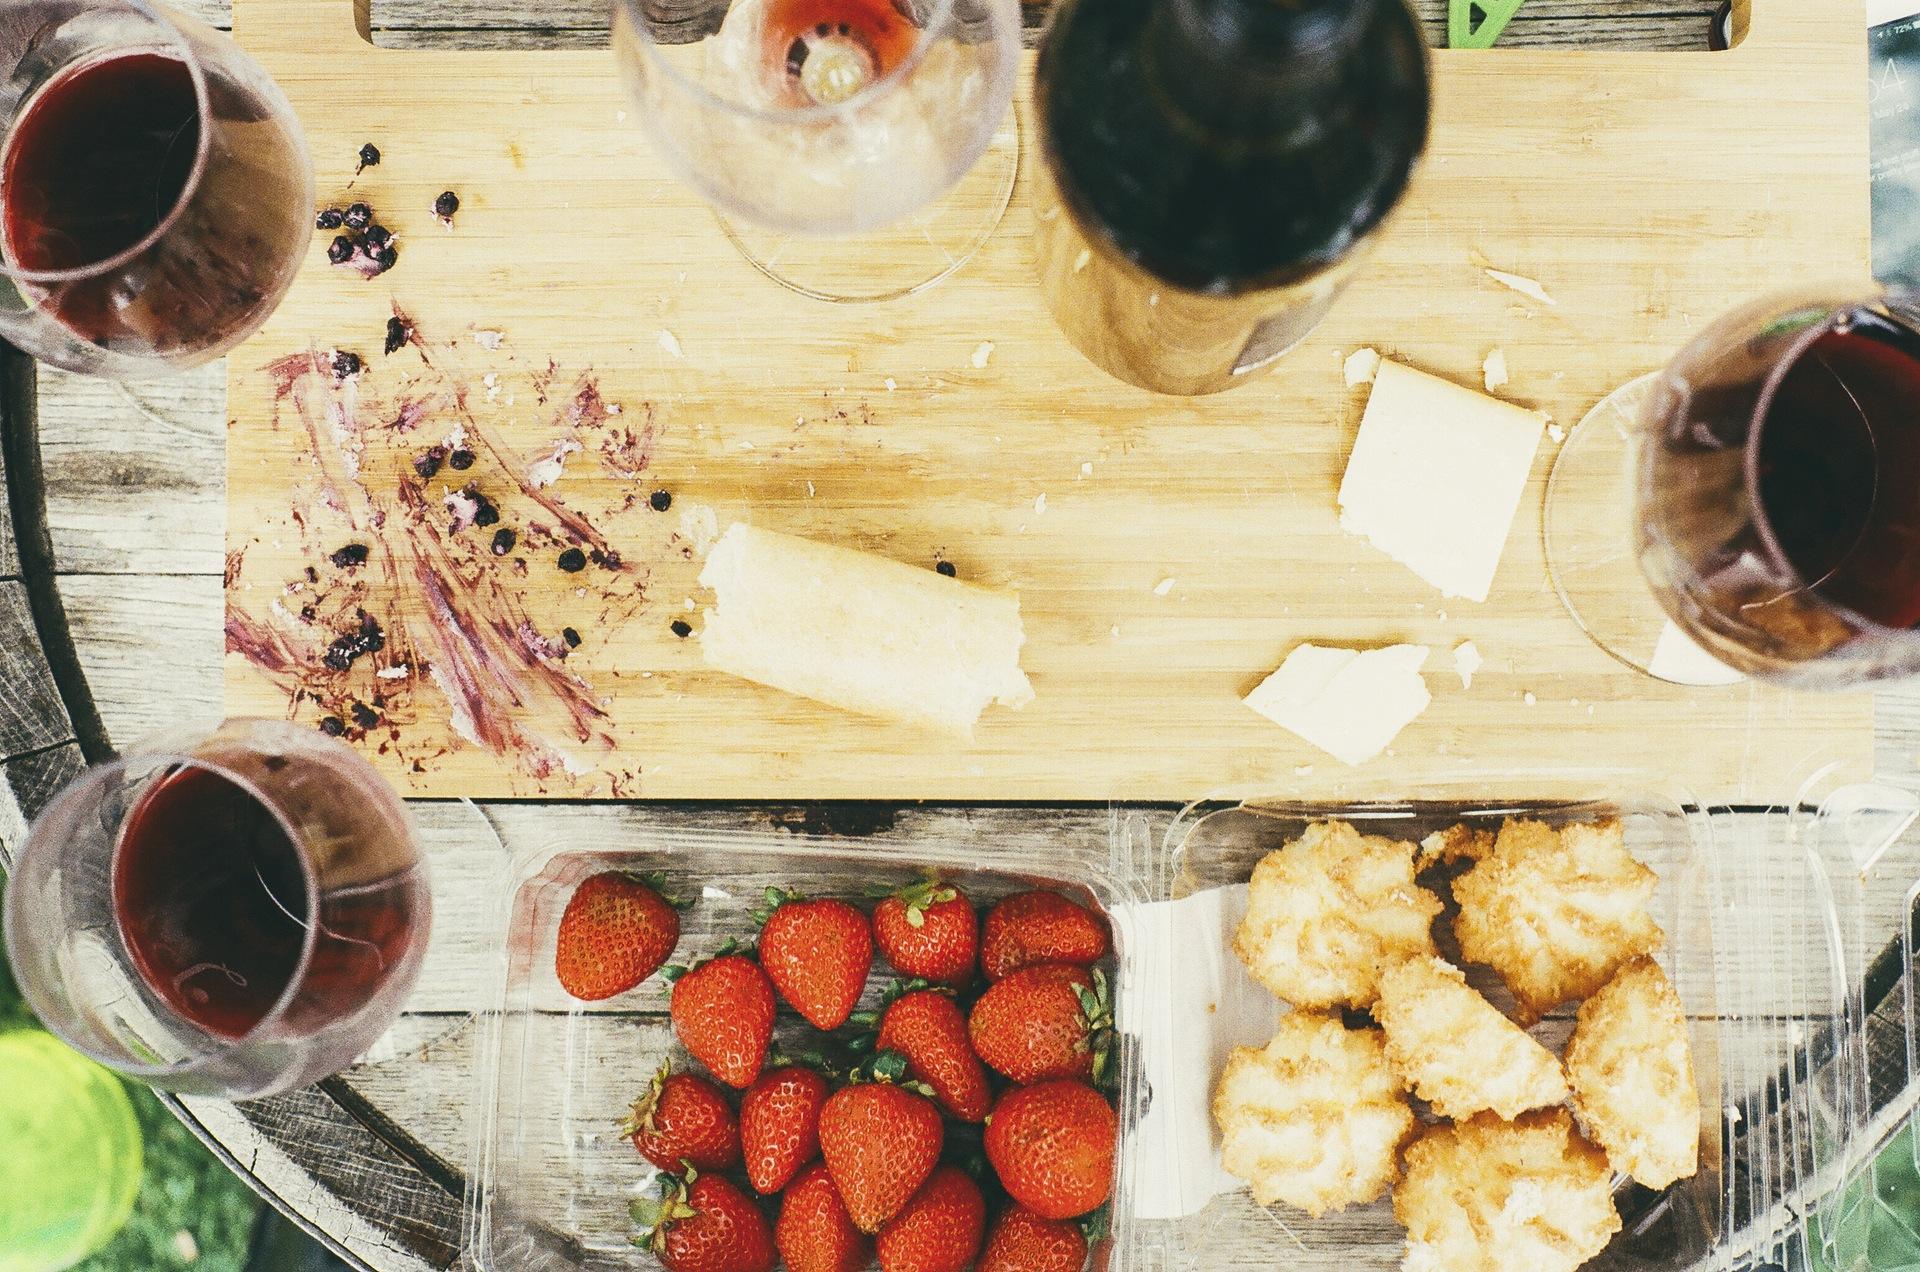 https://www.dotmug.net/wp-content/uploads/2016/06/food-wine.jpg